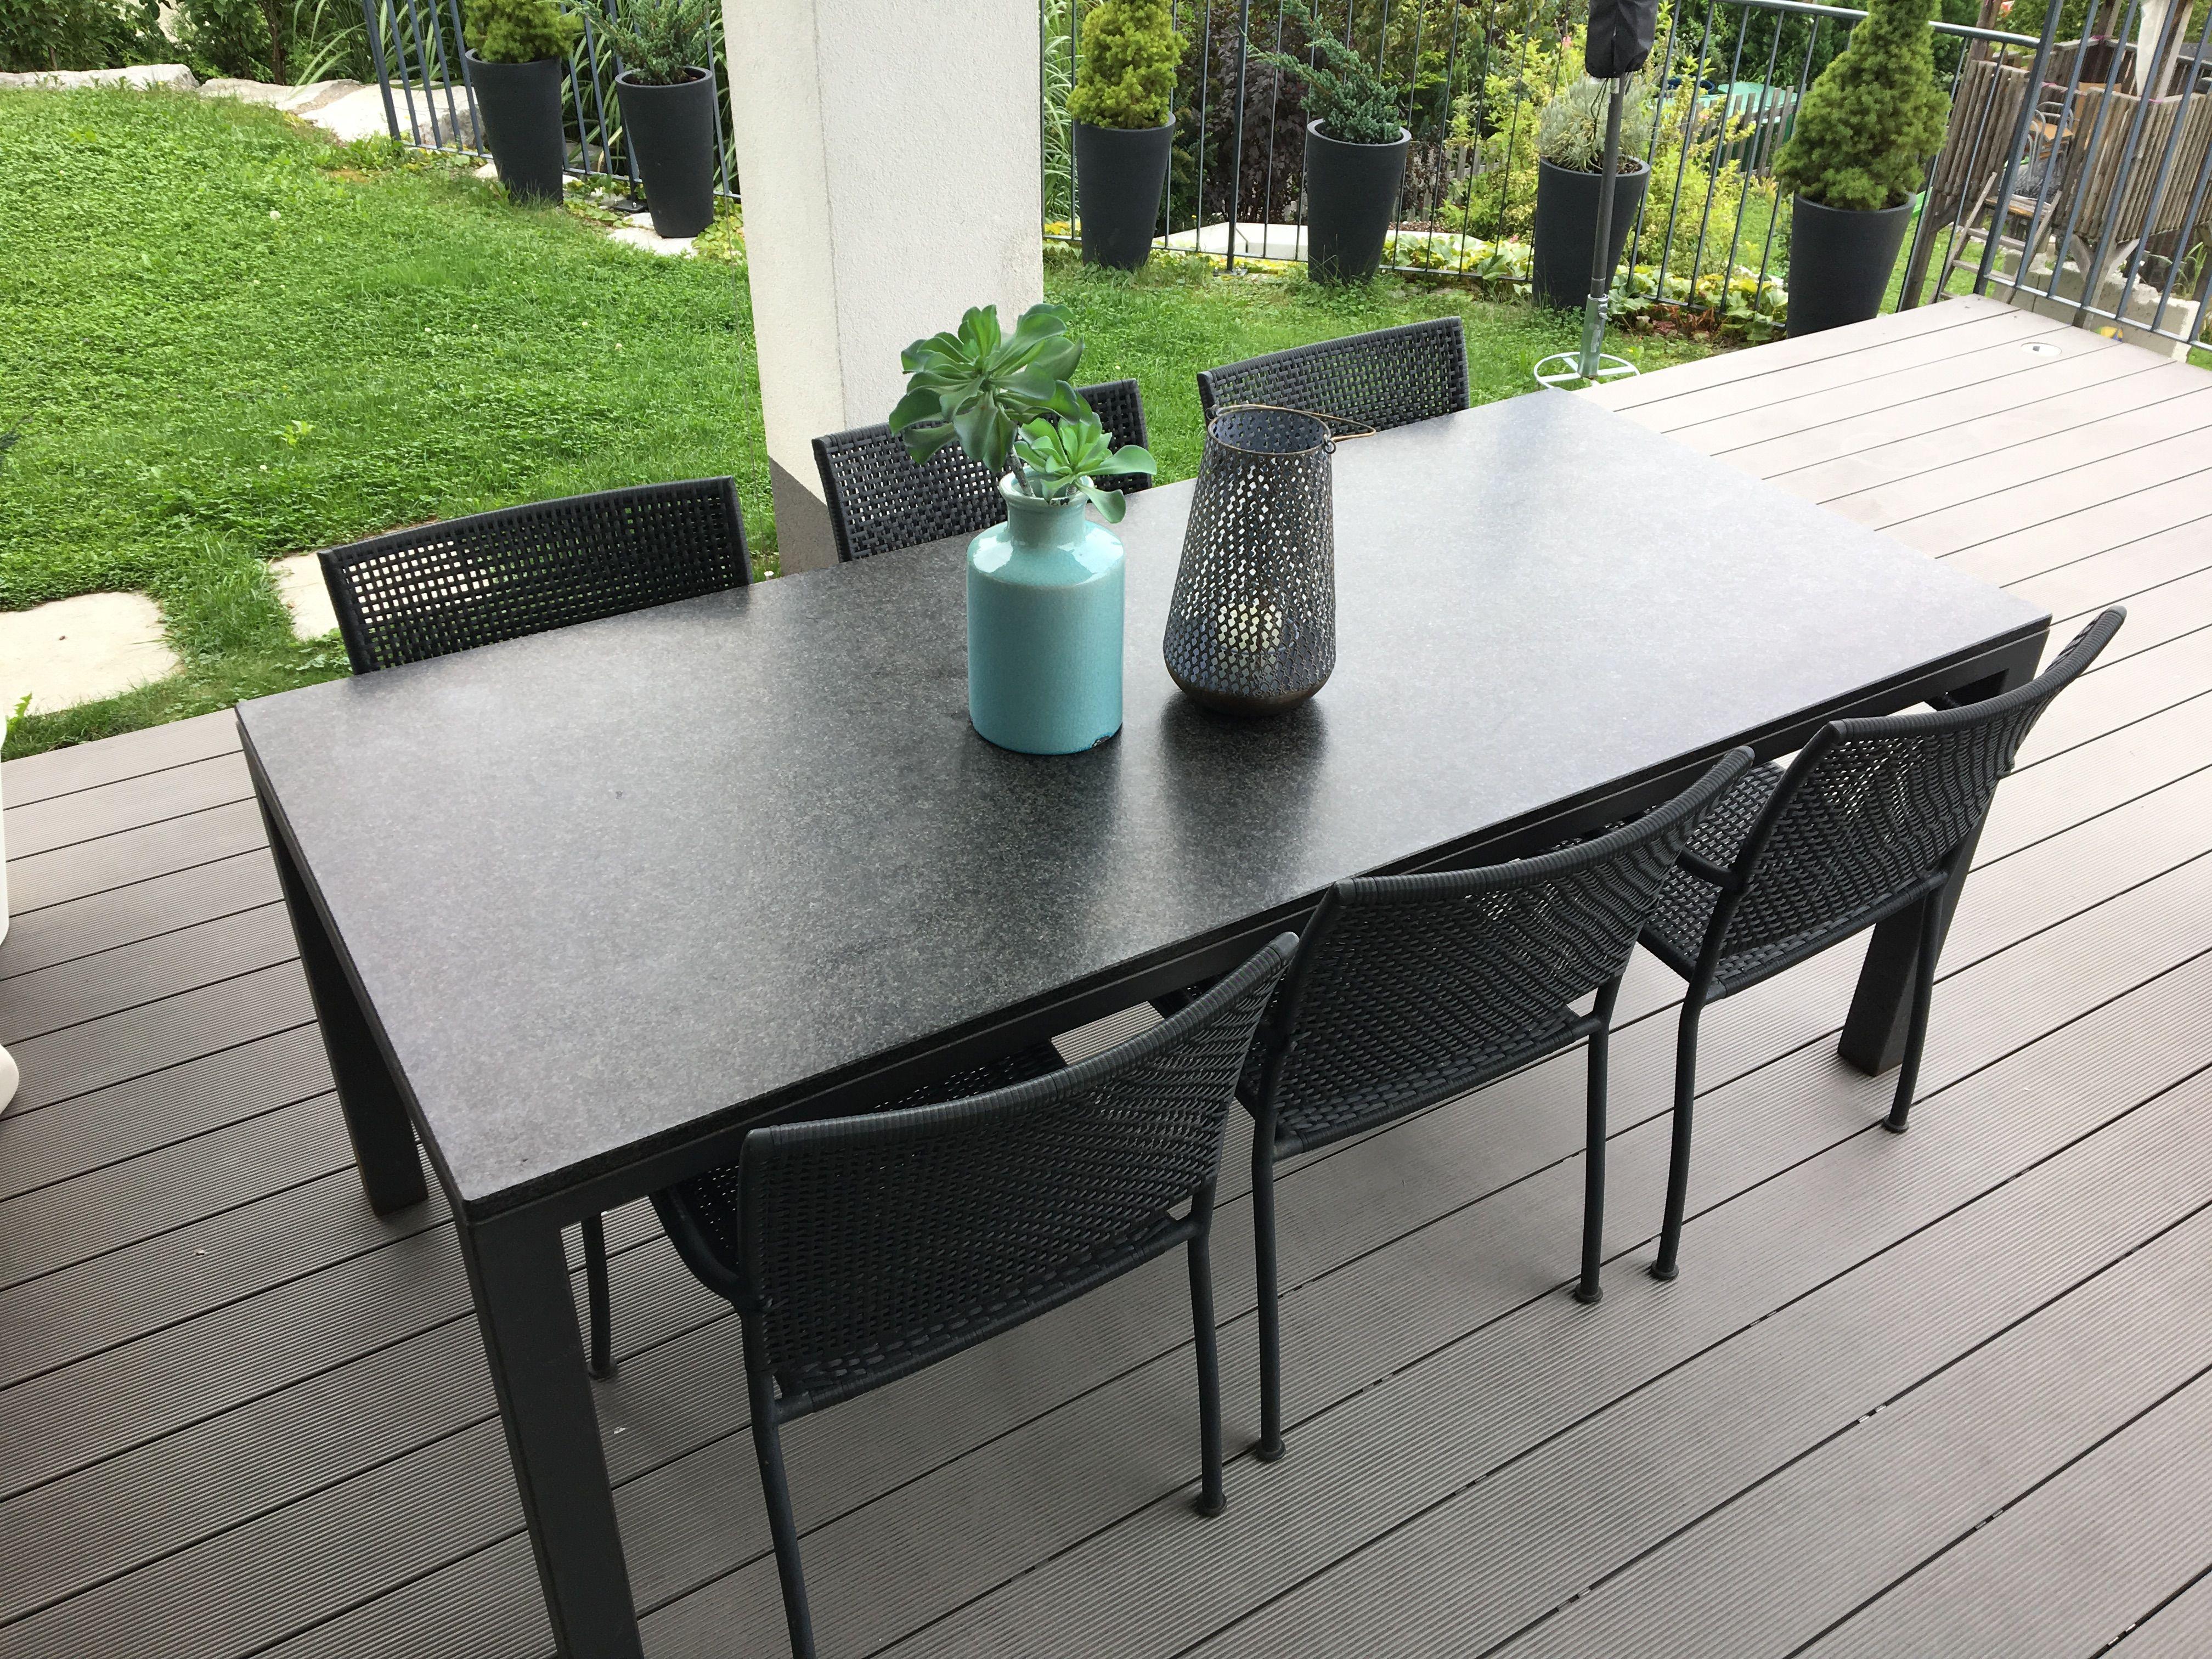 Outdoor Tisch Granit Granittisch Outdoor Tisch Tisch Bauen